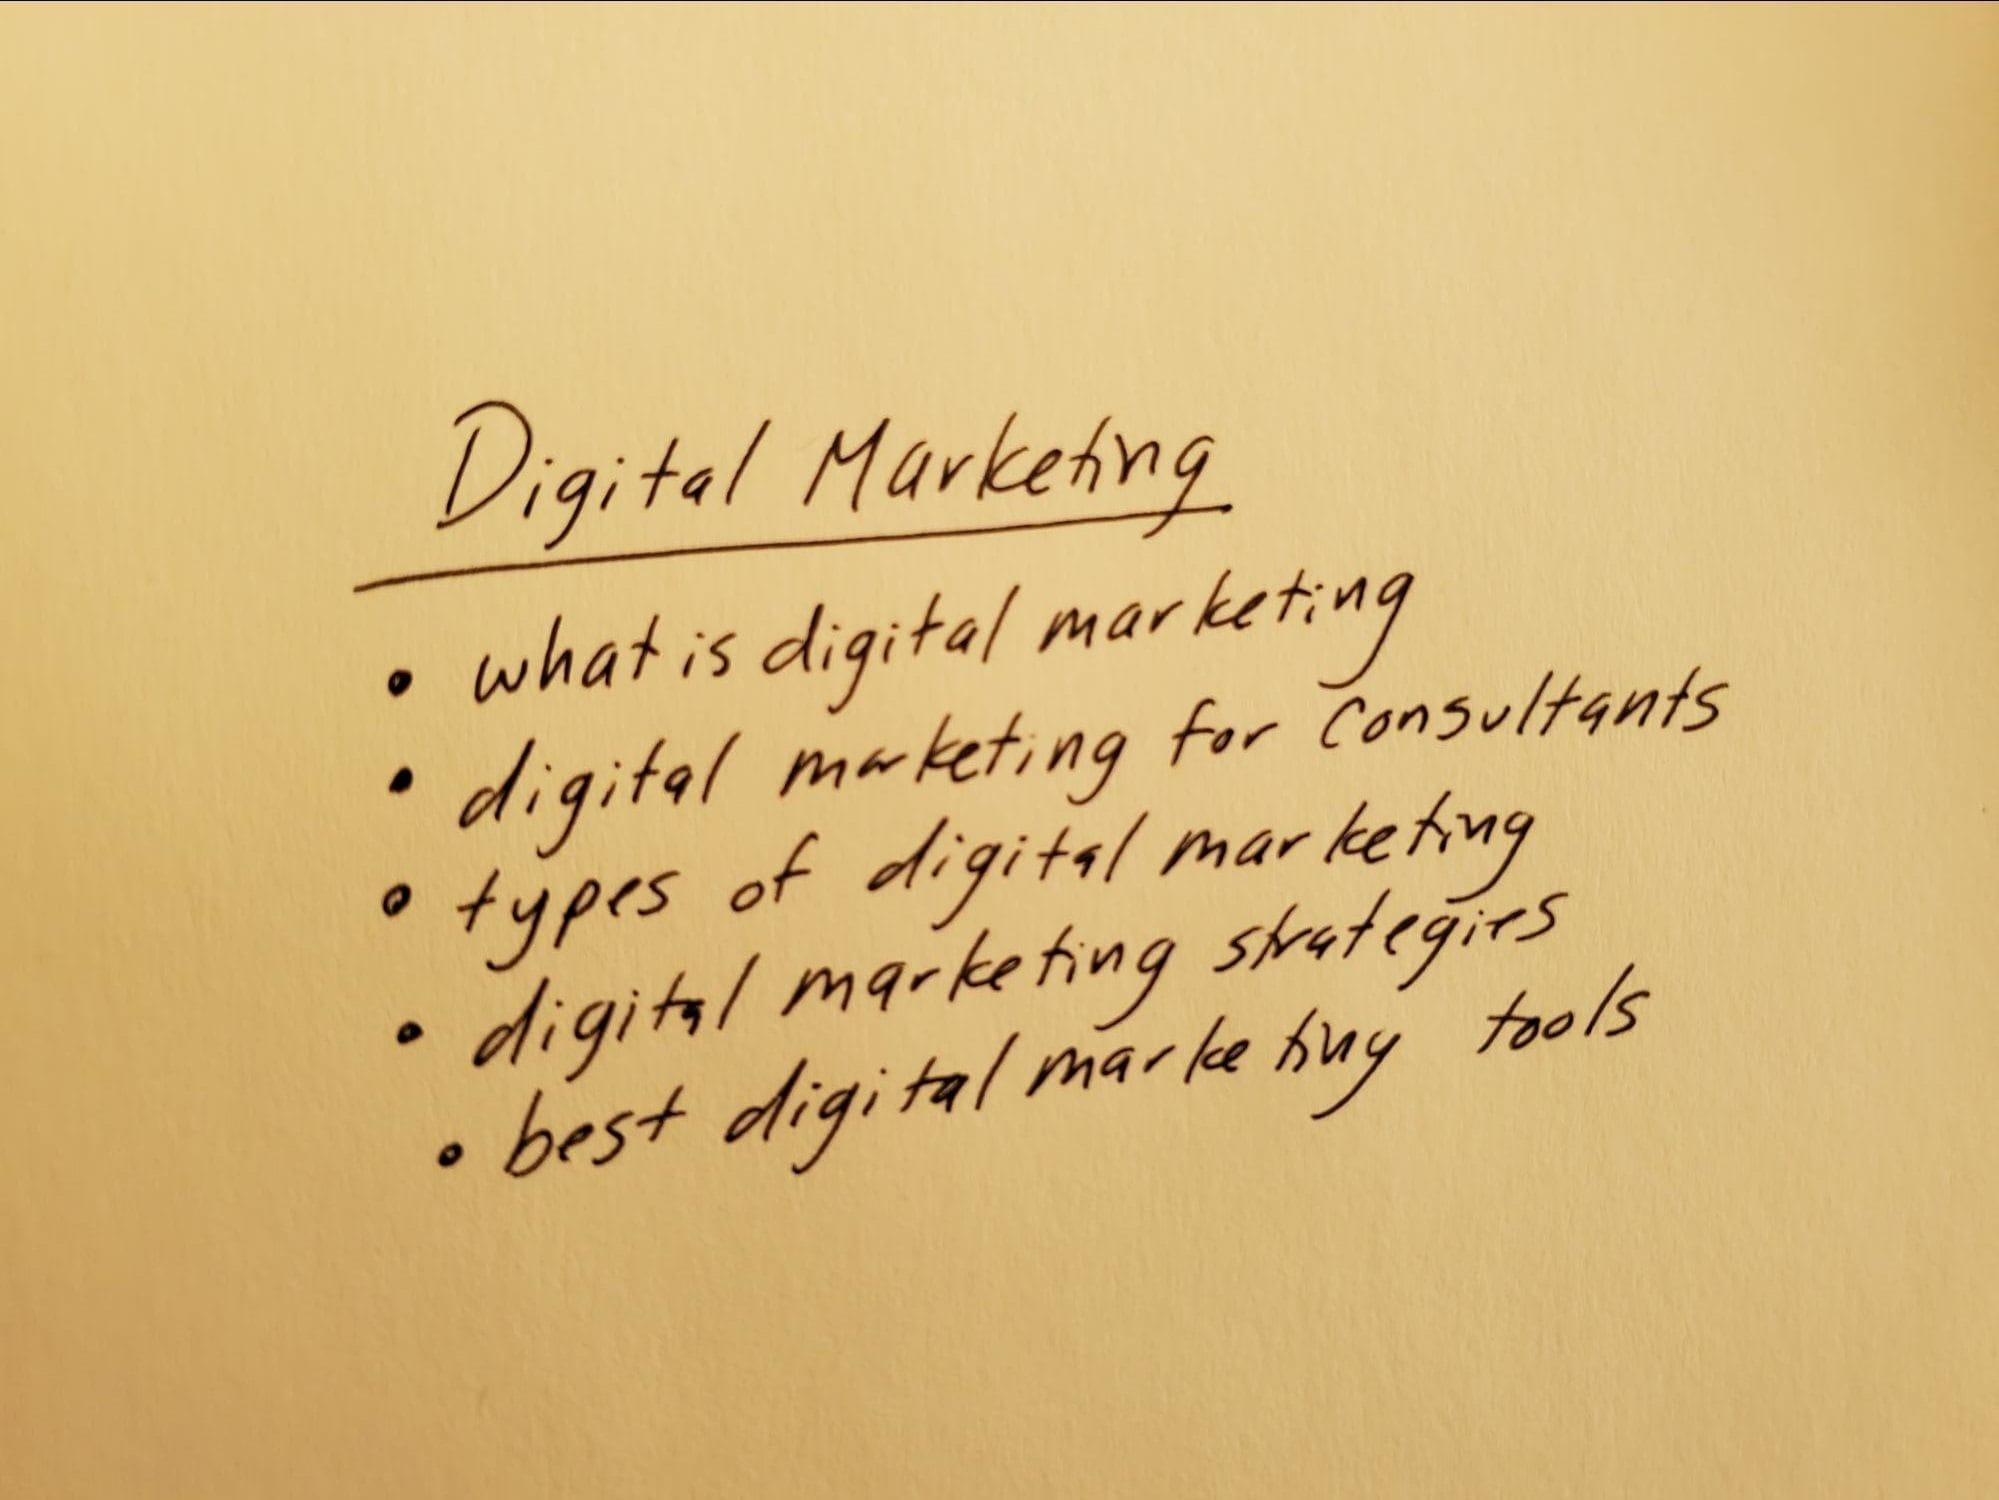 Digital marketing keyword list written on scratch paper